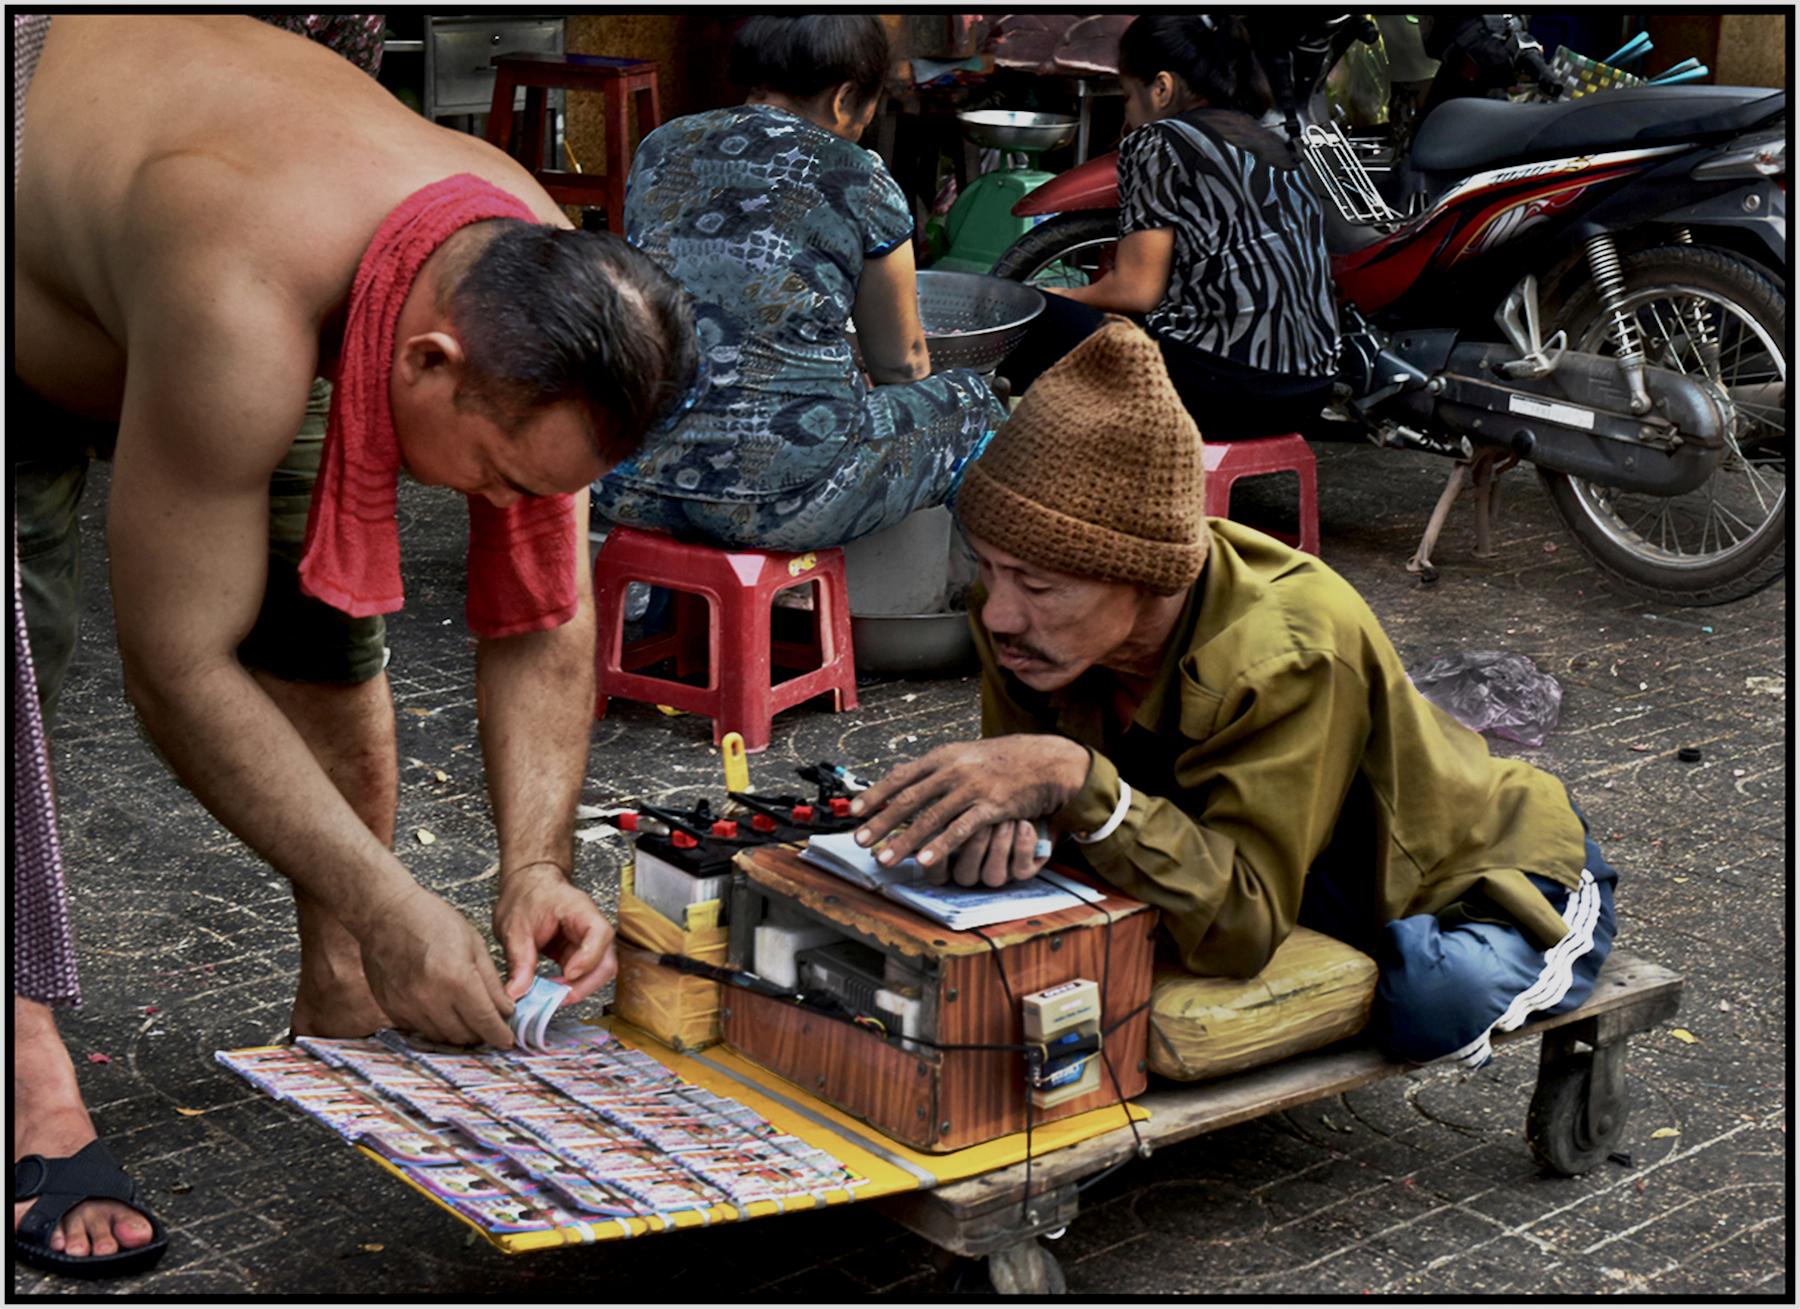 Man with no legs sells lottery tickets amidst vendors at the Binh Tay Market, Cholon, Saigon/HCMC, Dec. 2015. #3848